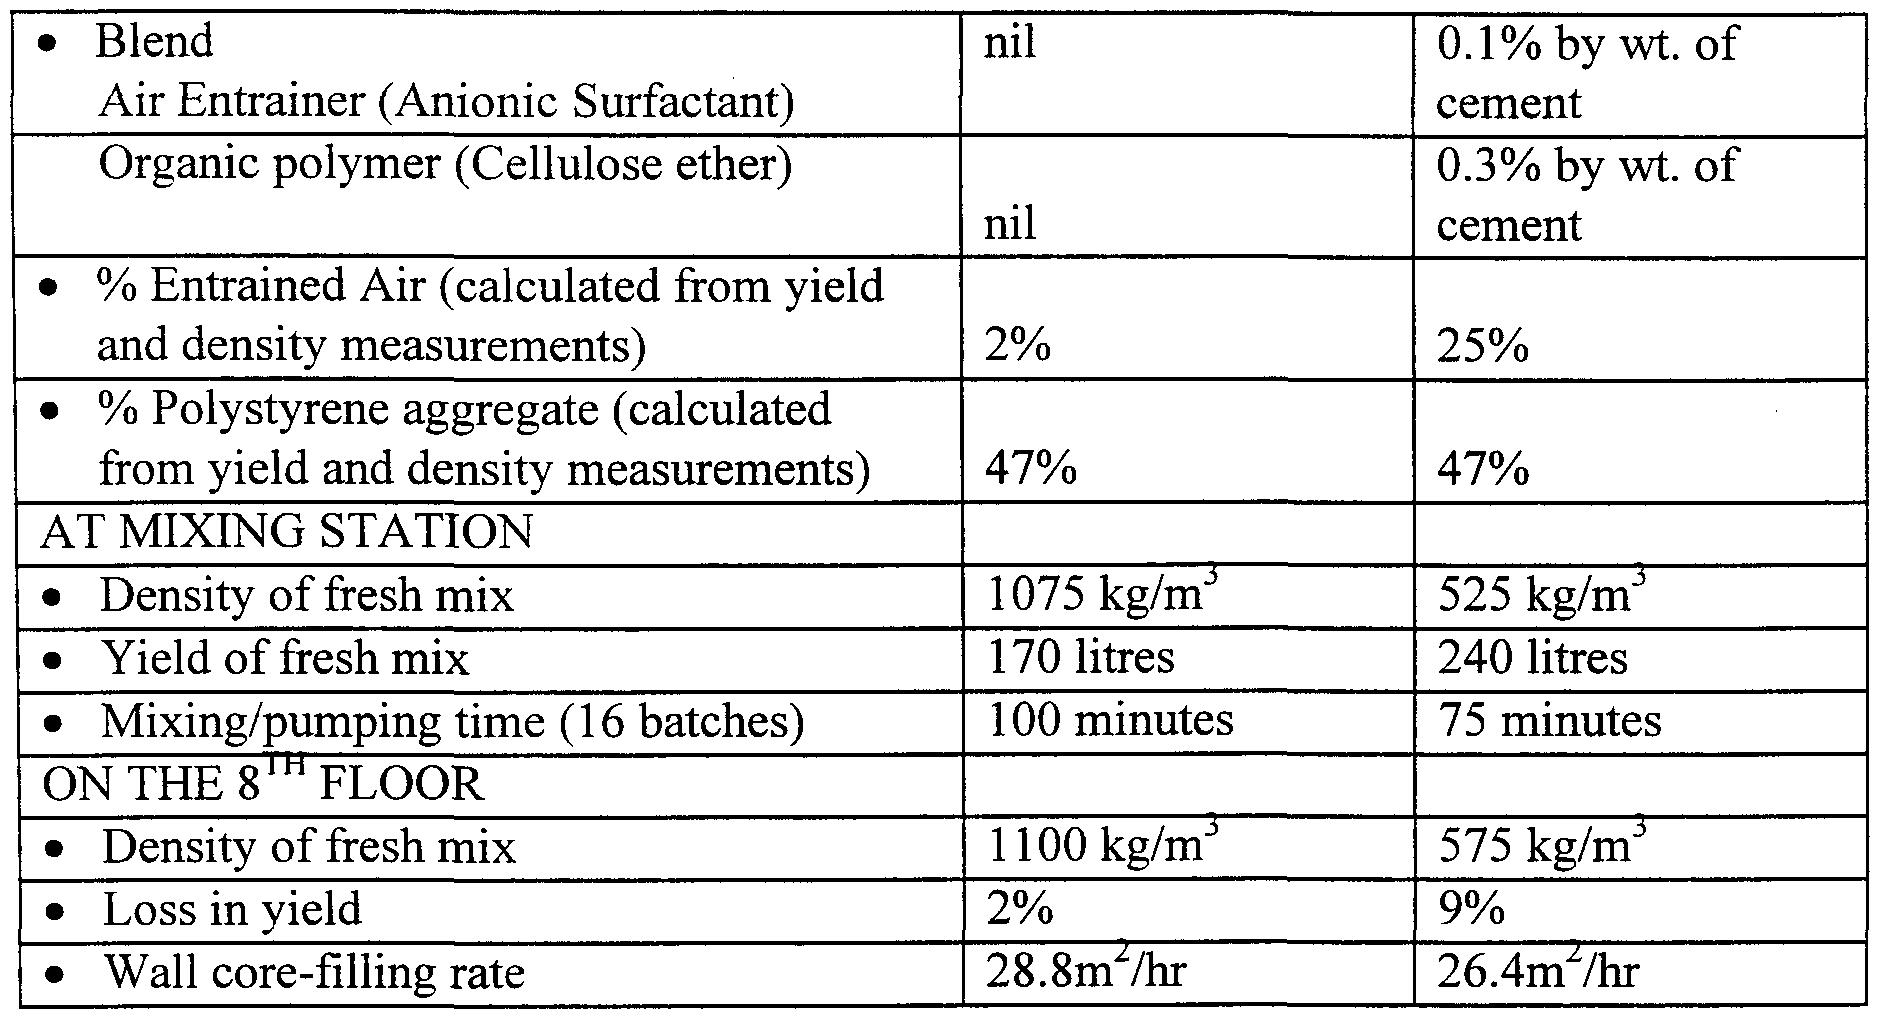 WO2000061519A1 - Concrete formulation - Google Patents